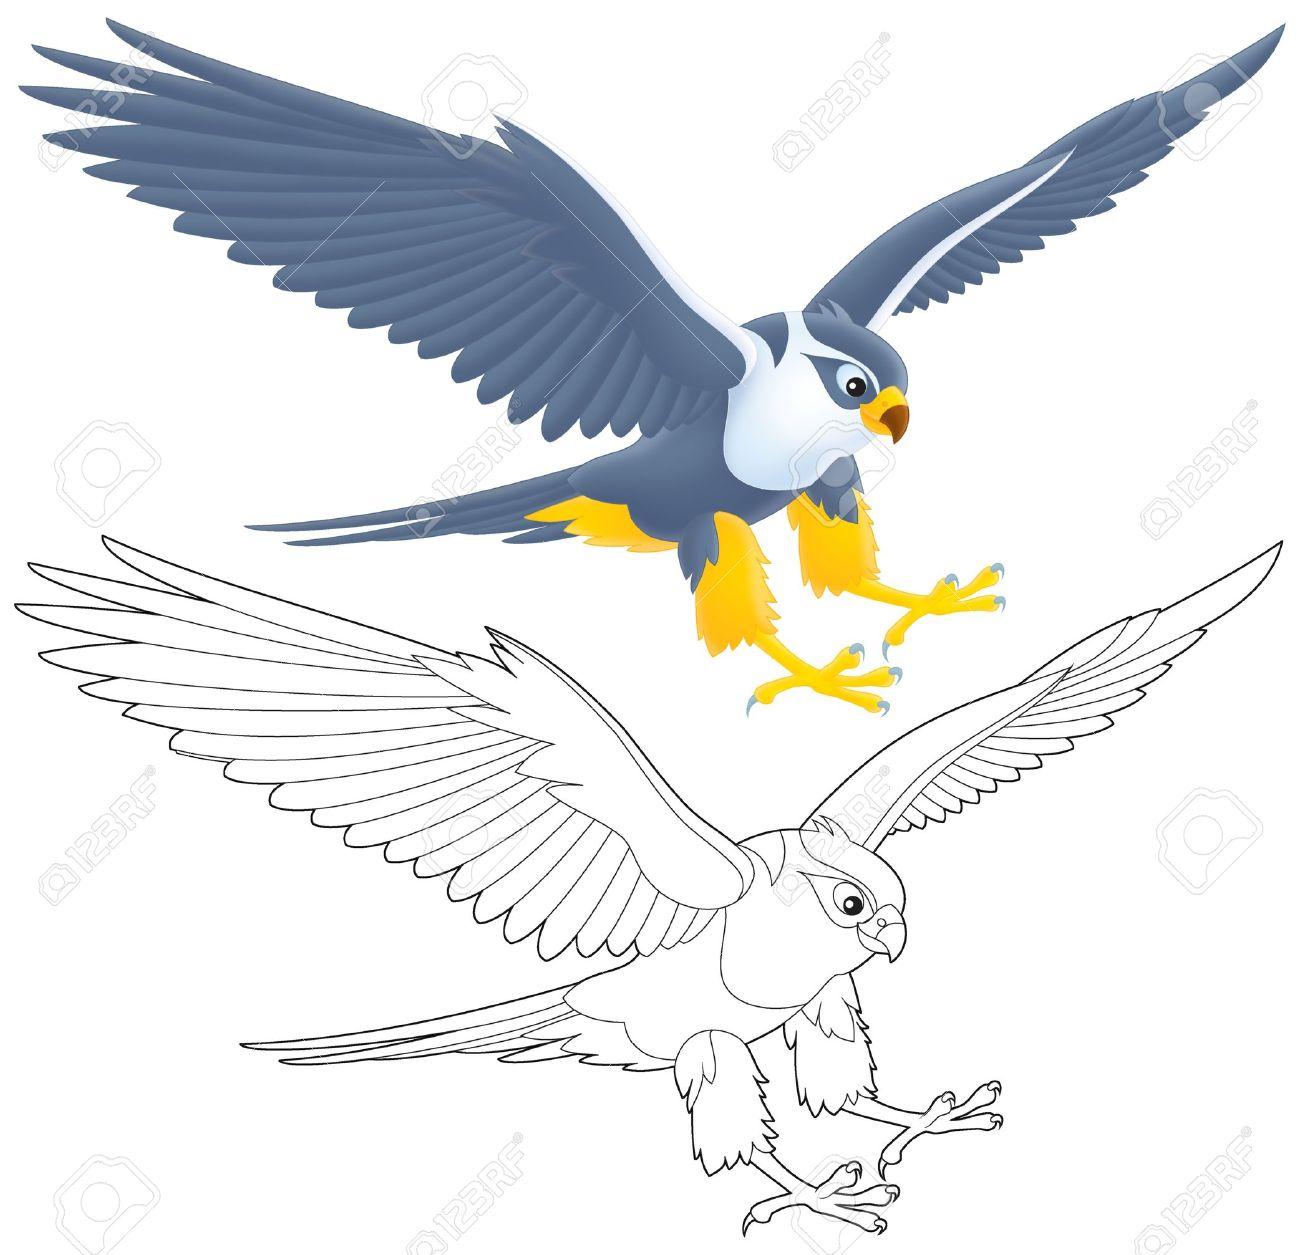 Peregrine Falcon clipart falcon flying Photo#2 Flying Falcon Clipart Falcon